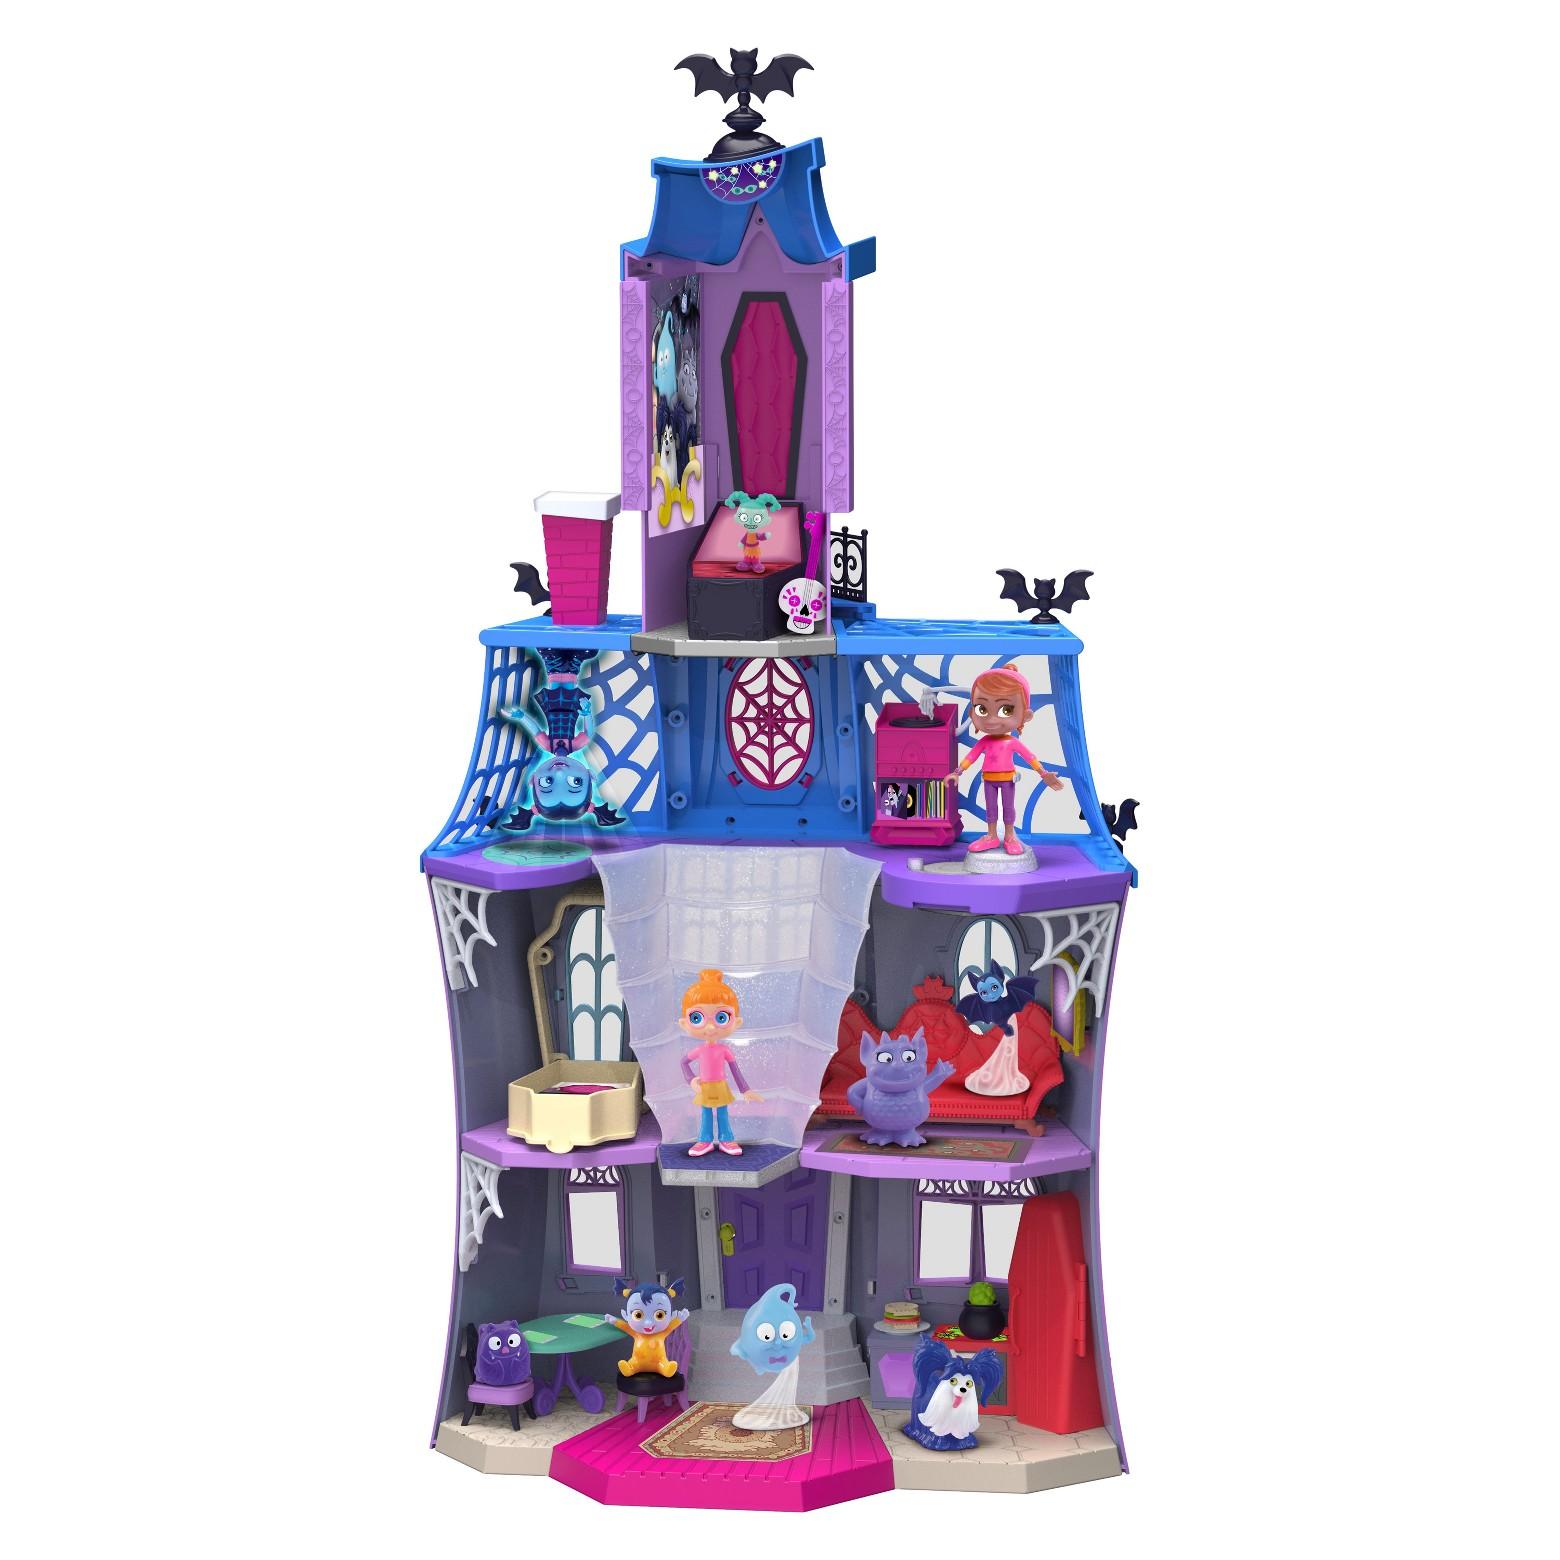 Bedroom Blueprint Holiday Time With Disney Junior S Vampirina The Scare B